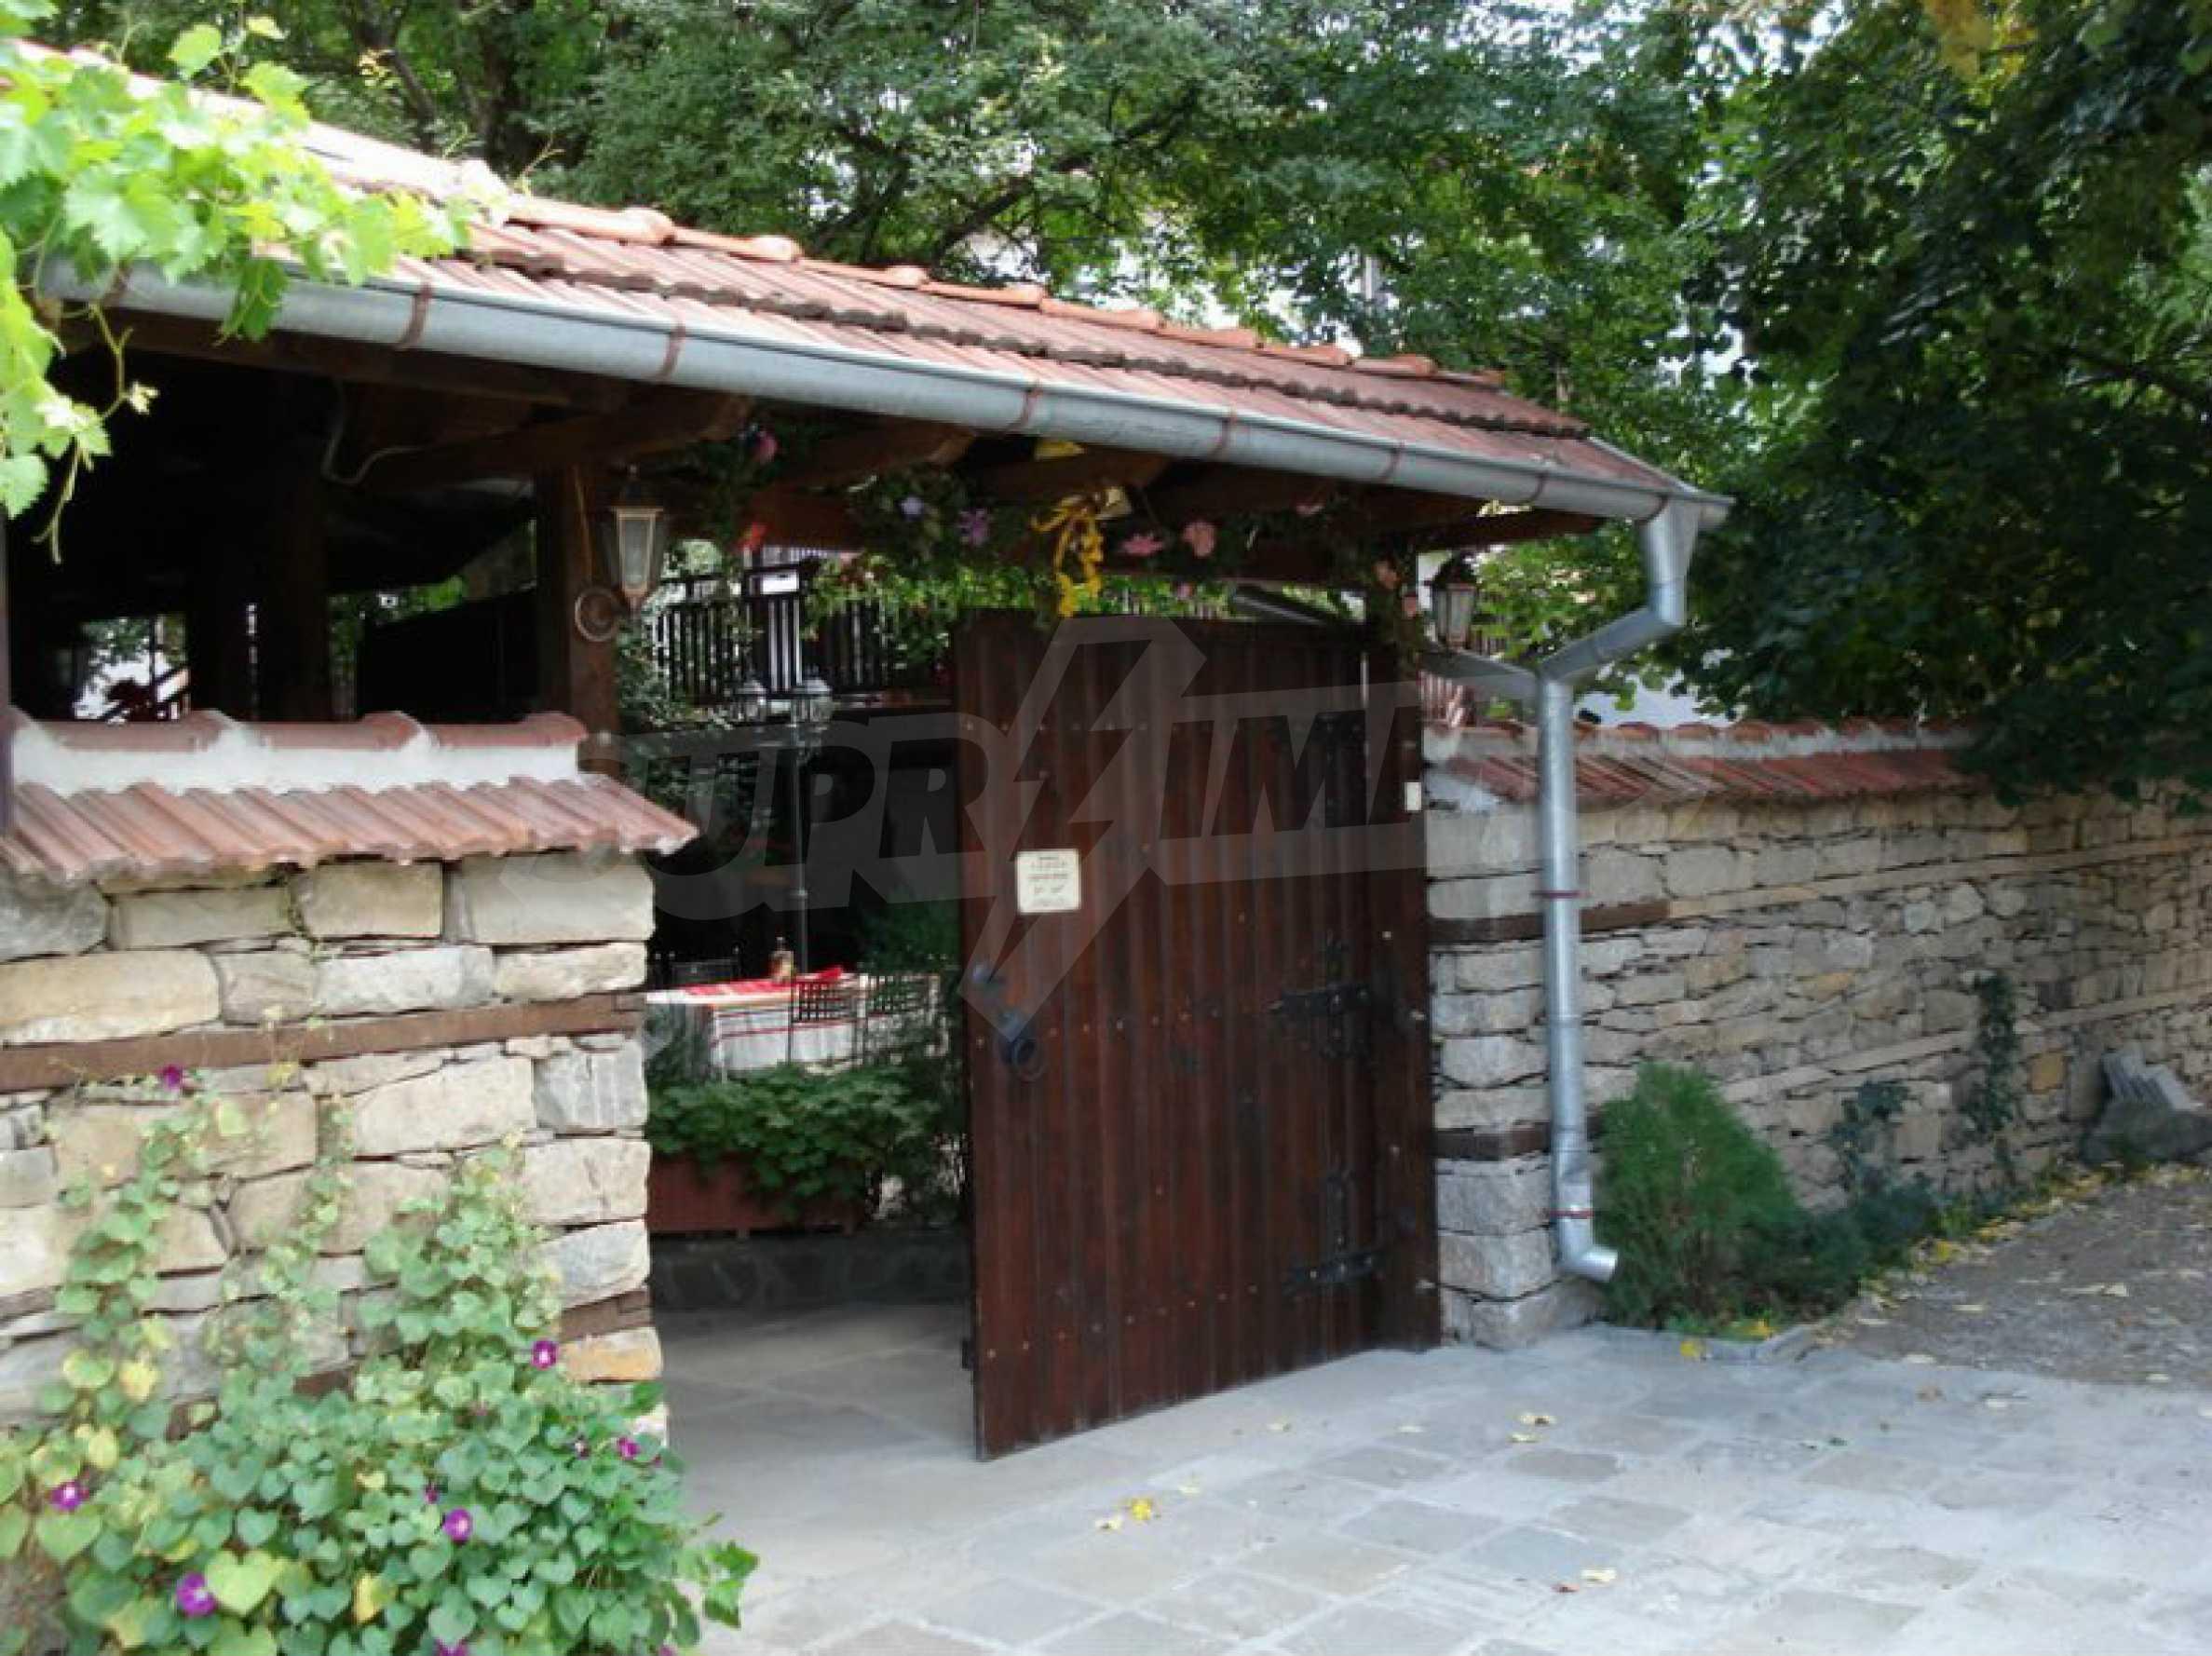 Hotelanlage mit Restaurant am Ufer des Flusses Osam in Lovech 18